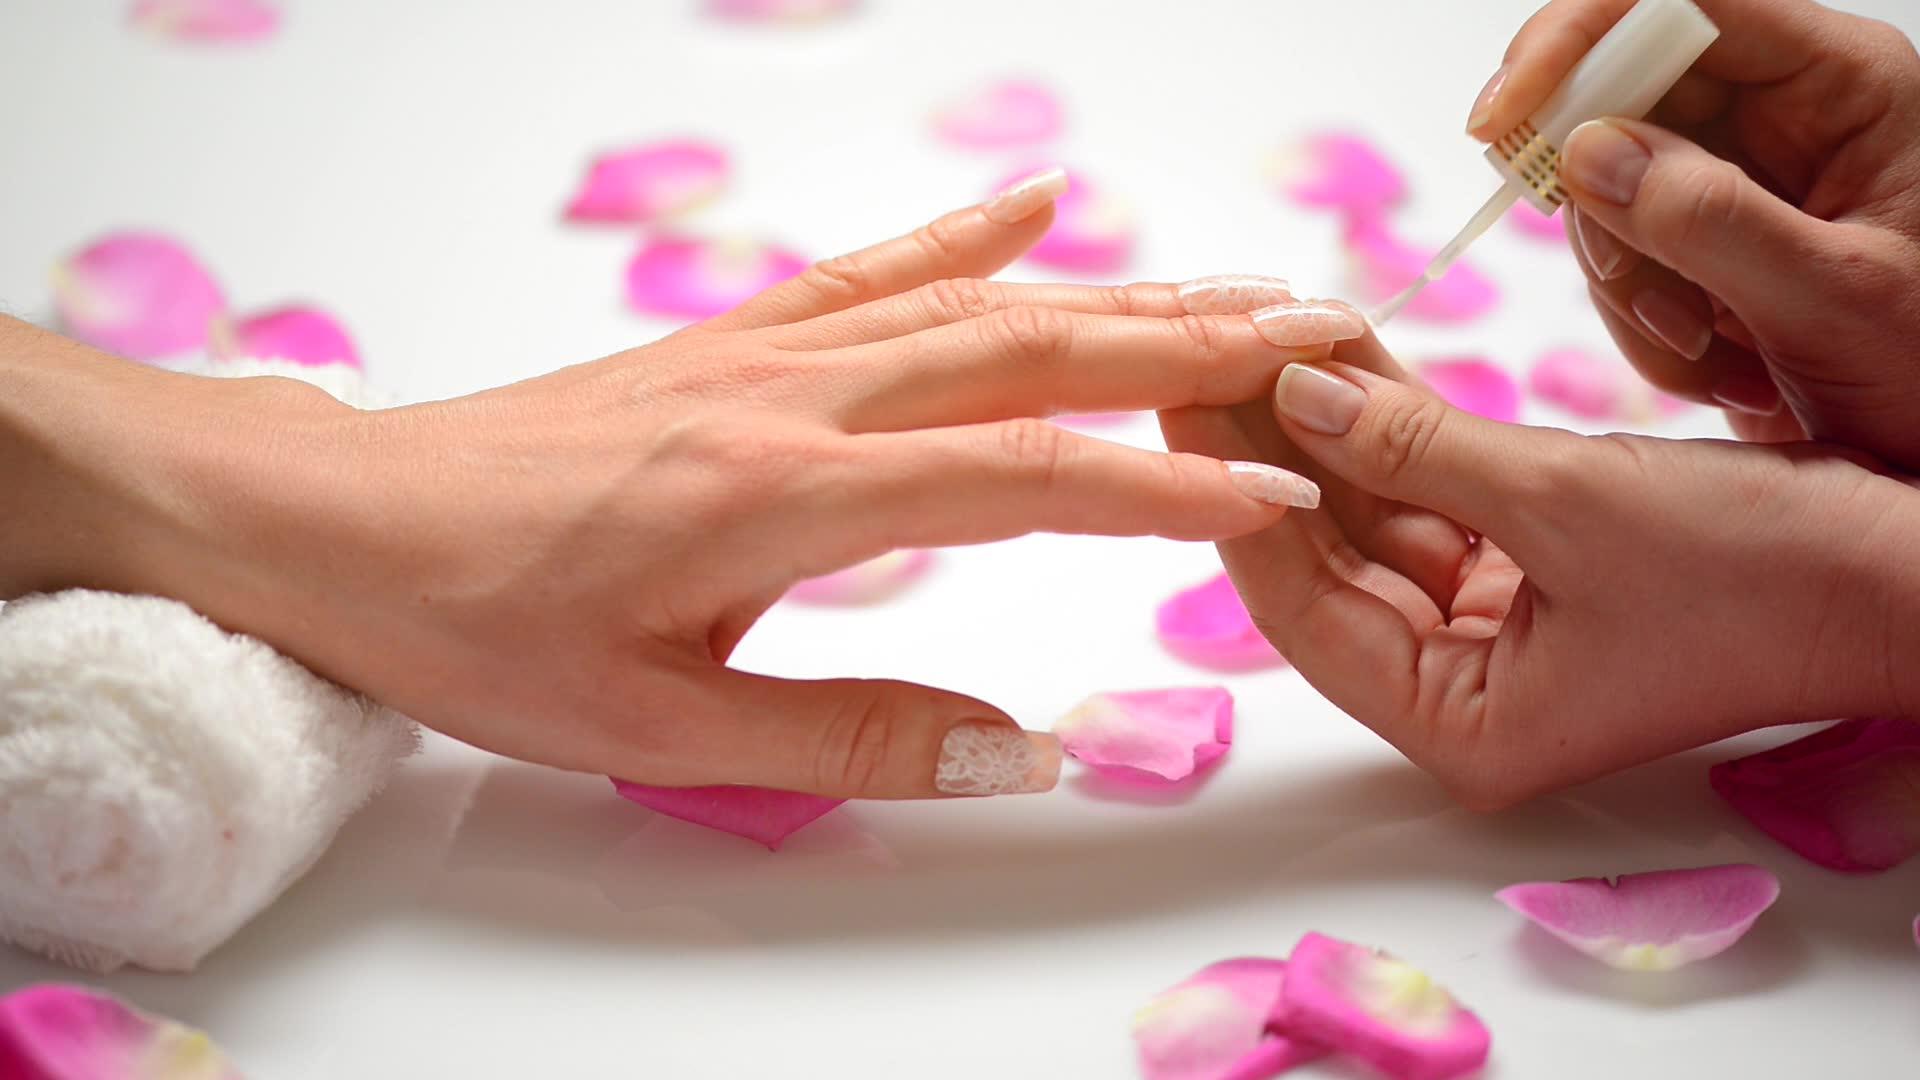 Blush Nails Beauty Stockland Merrylands Shopping Centre